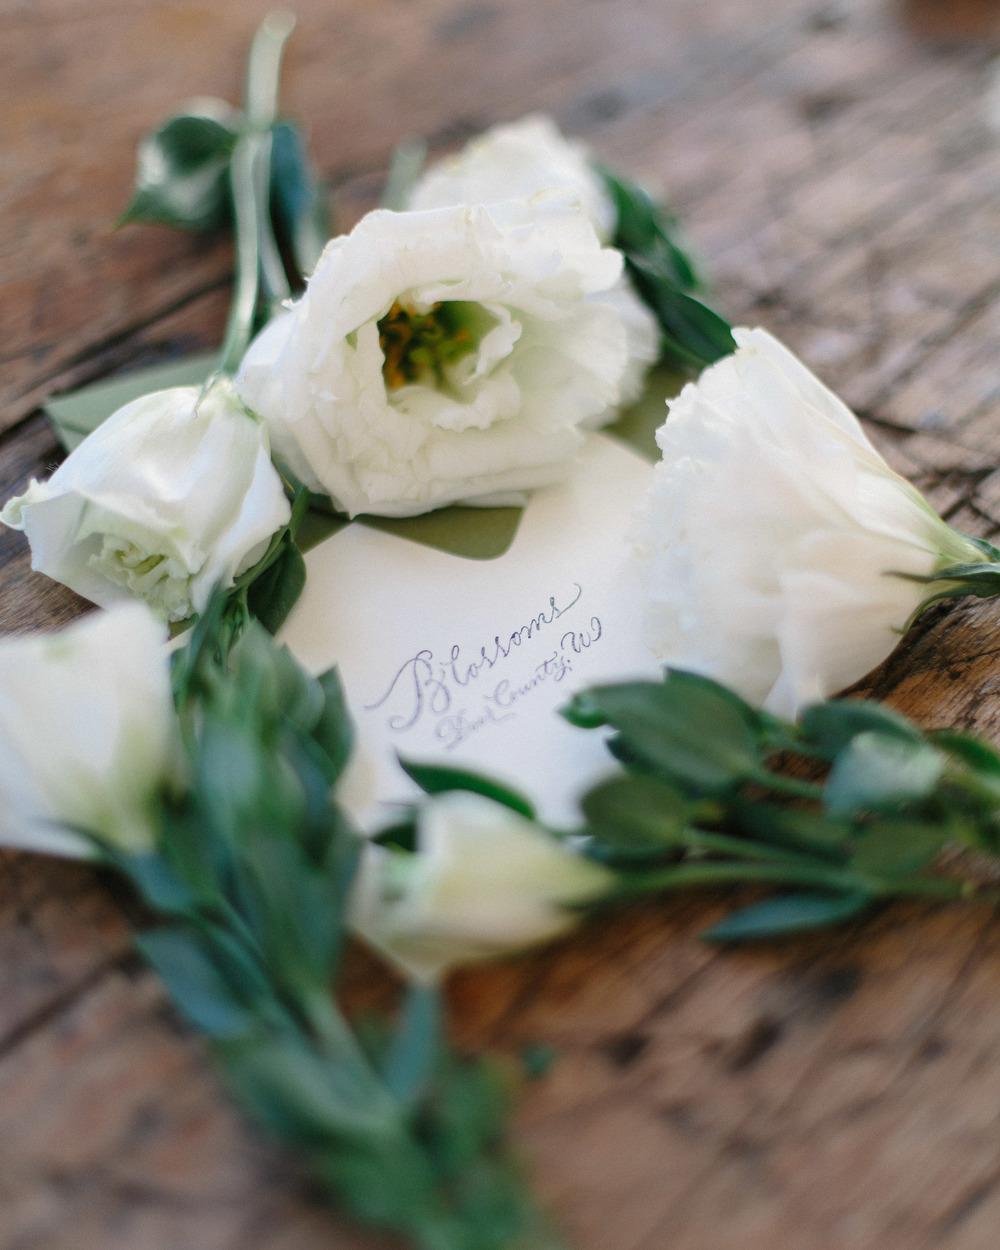 Doorcounty-sisterbay-florist.jpeg